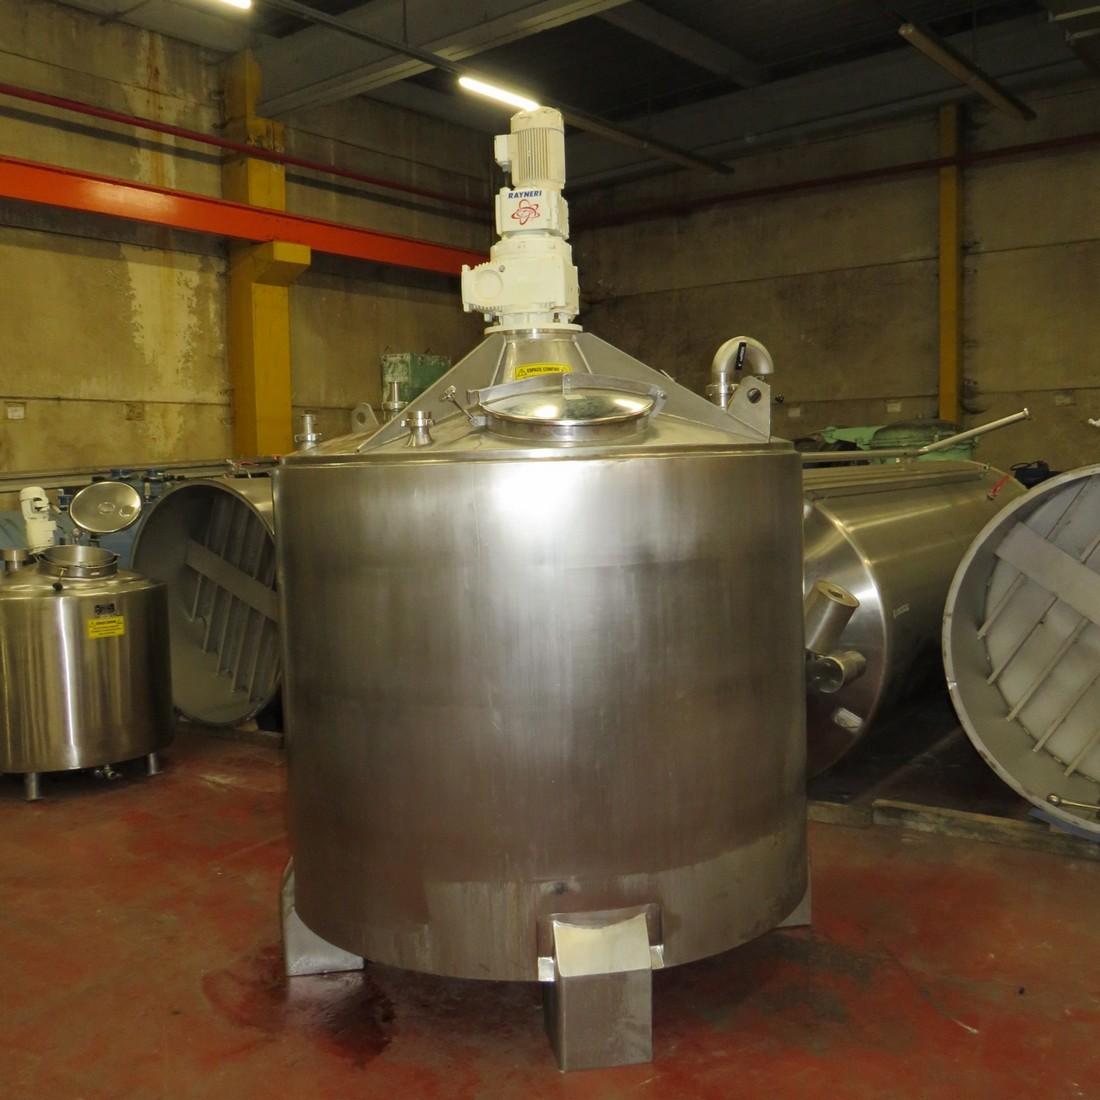 R6MA6114  Cuve mélangeuse inox 3600 litres